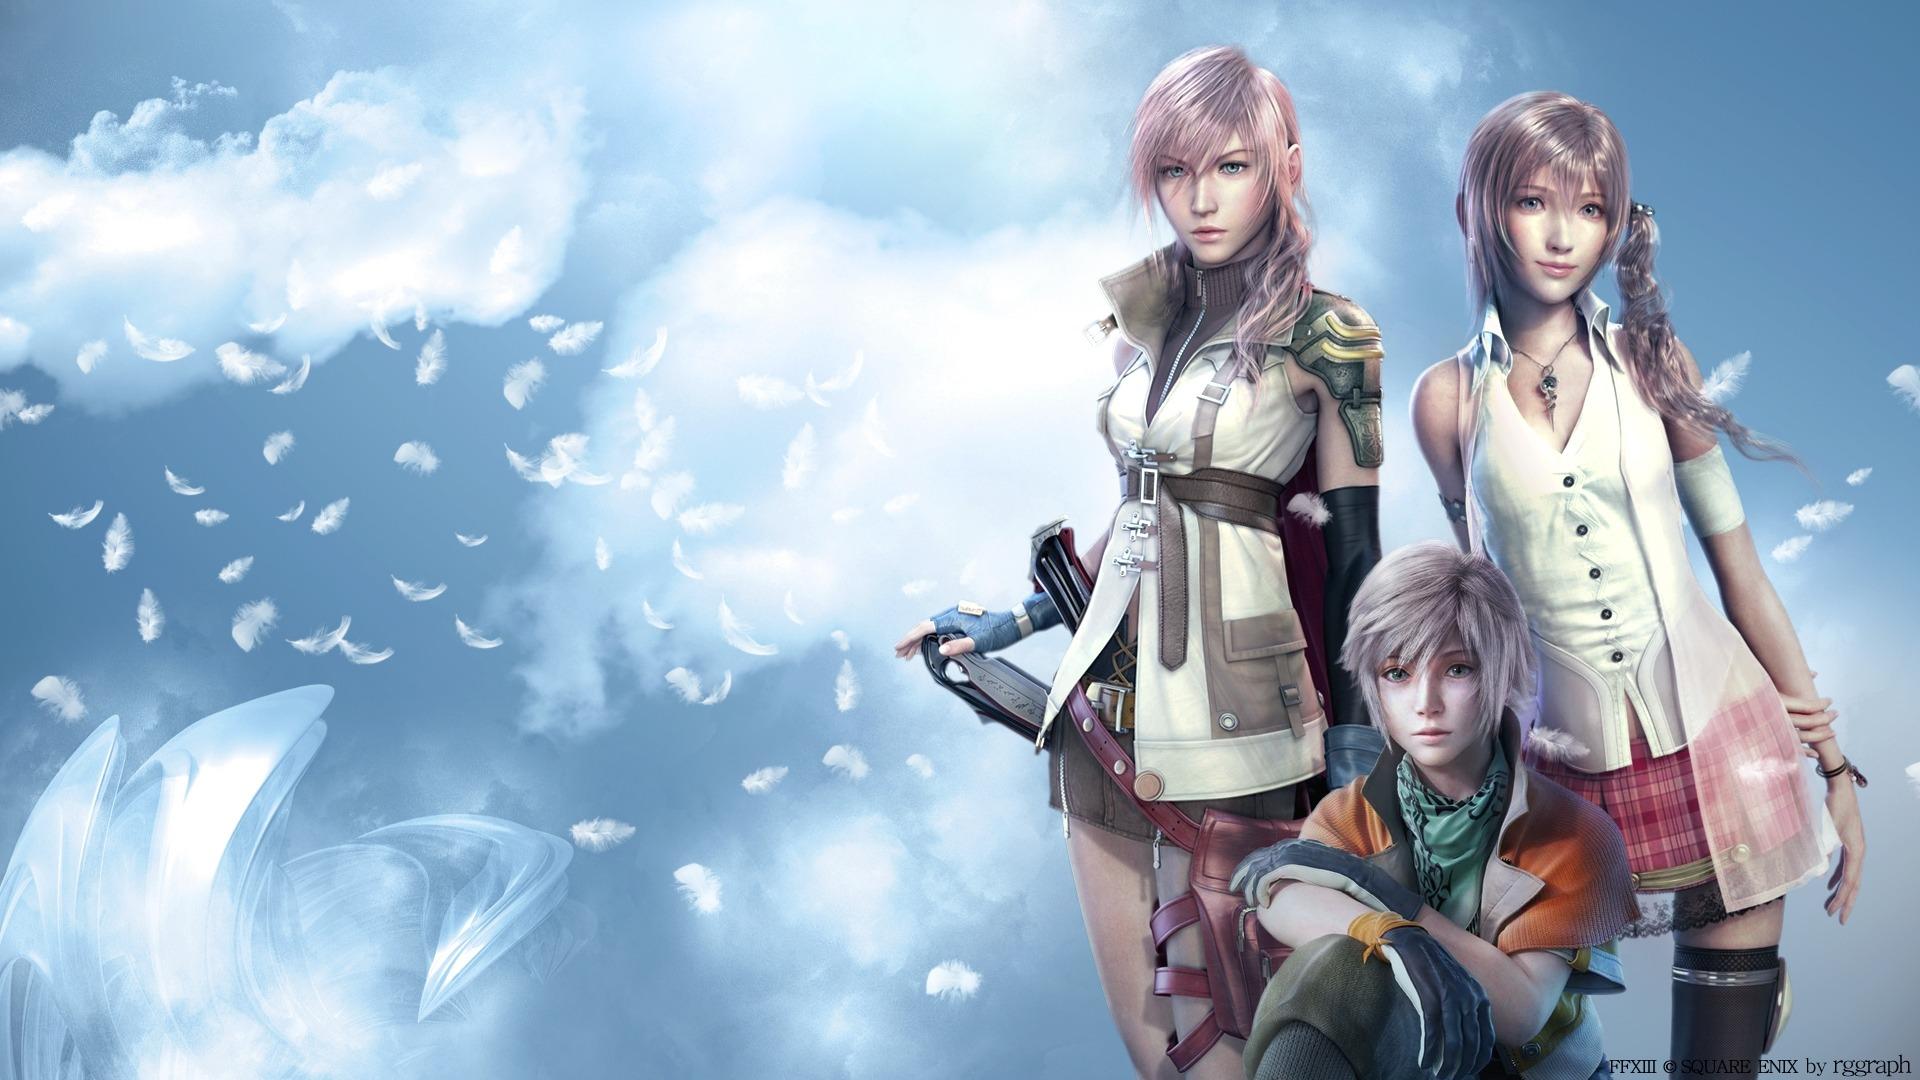 Final Fantasy wallpapers 14601 - Games - Television / Games